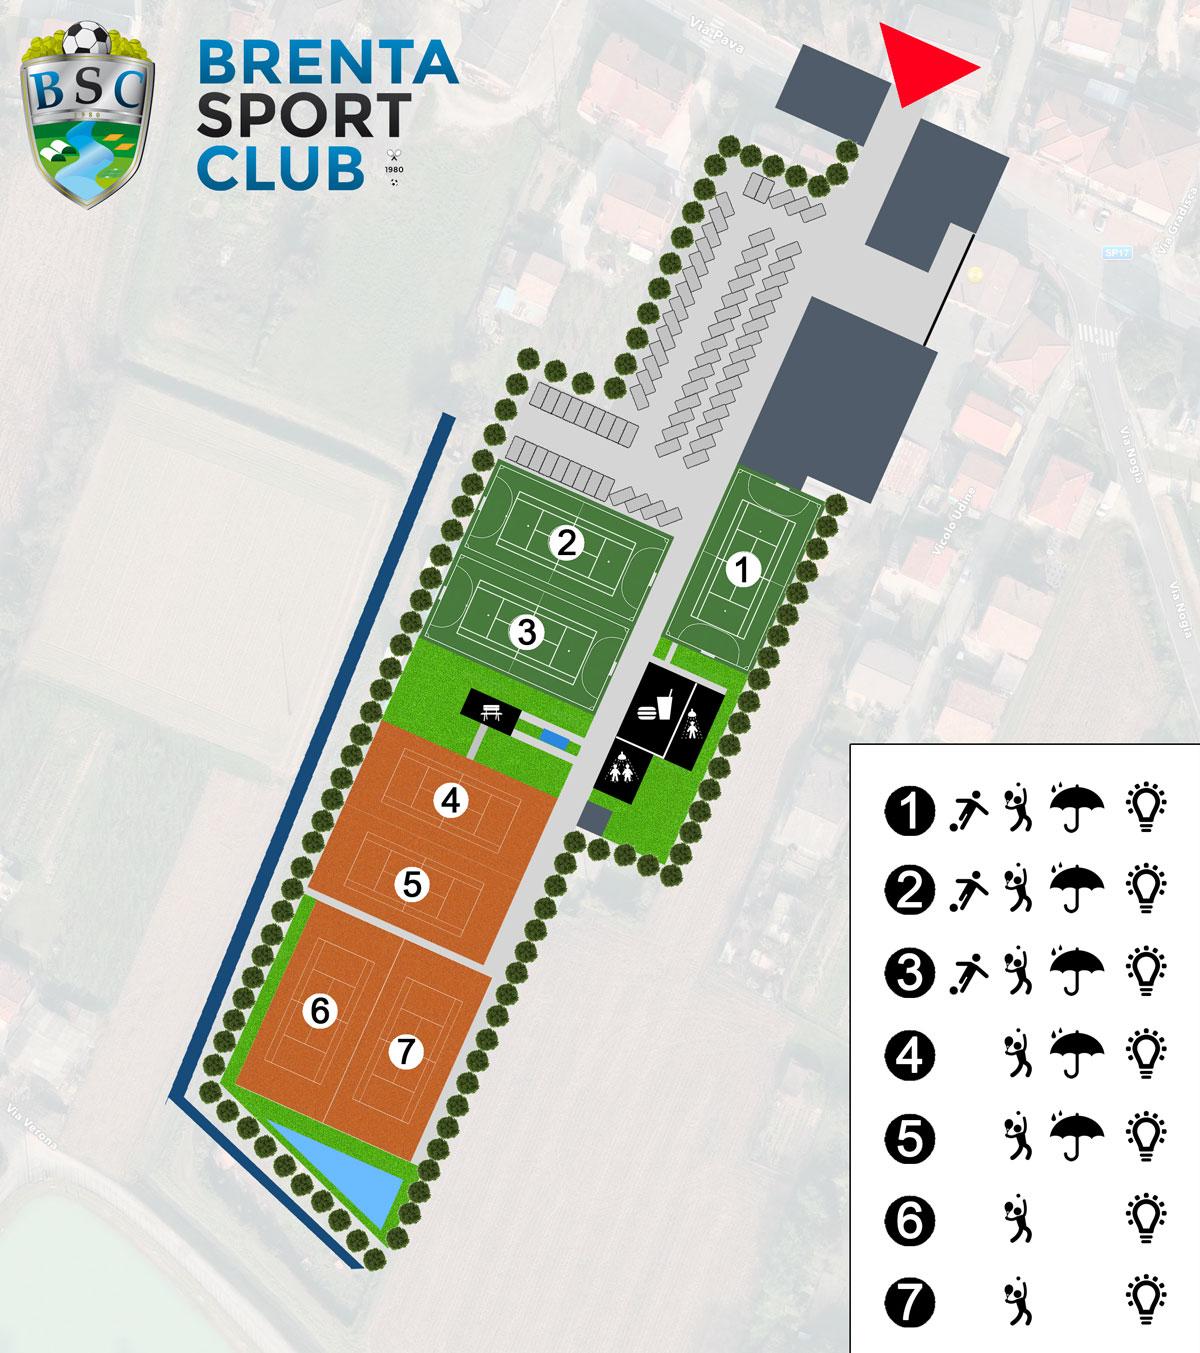 Planimetria-Brenta-Sport-Club